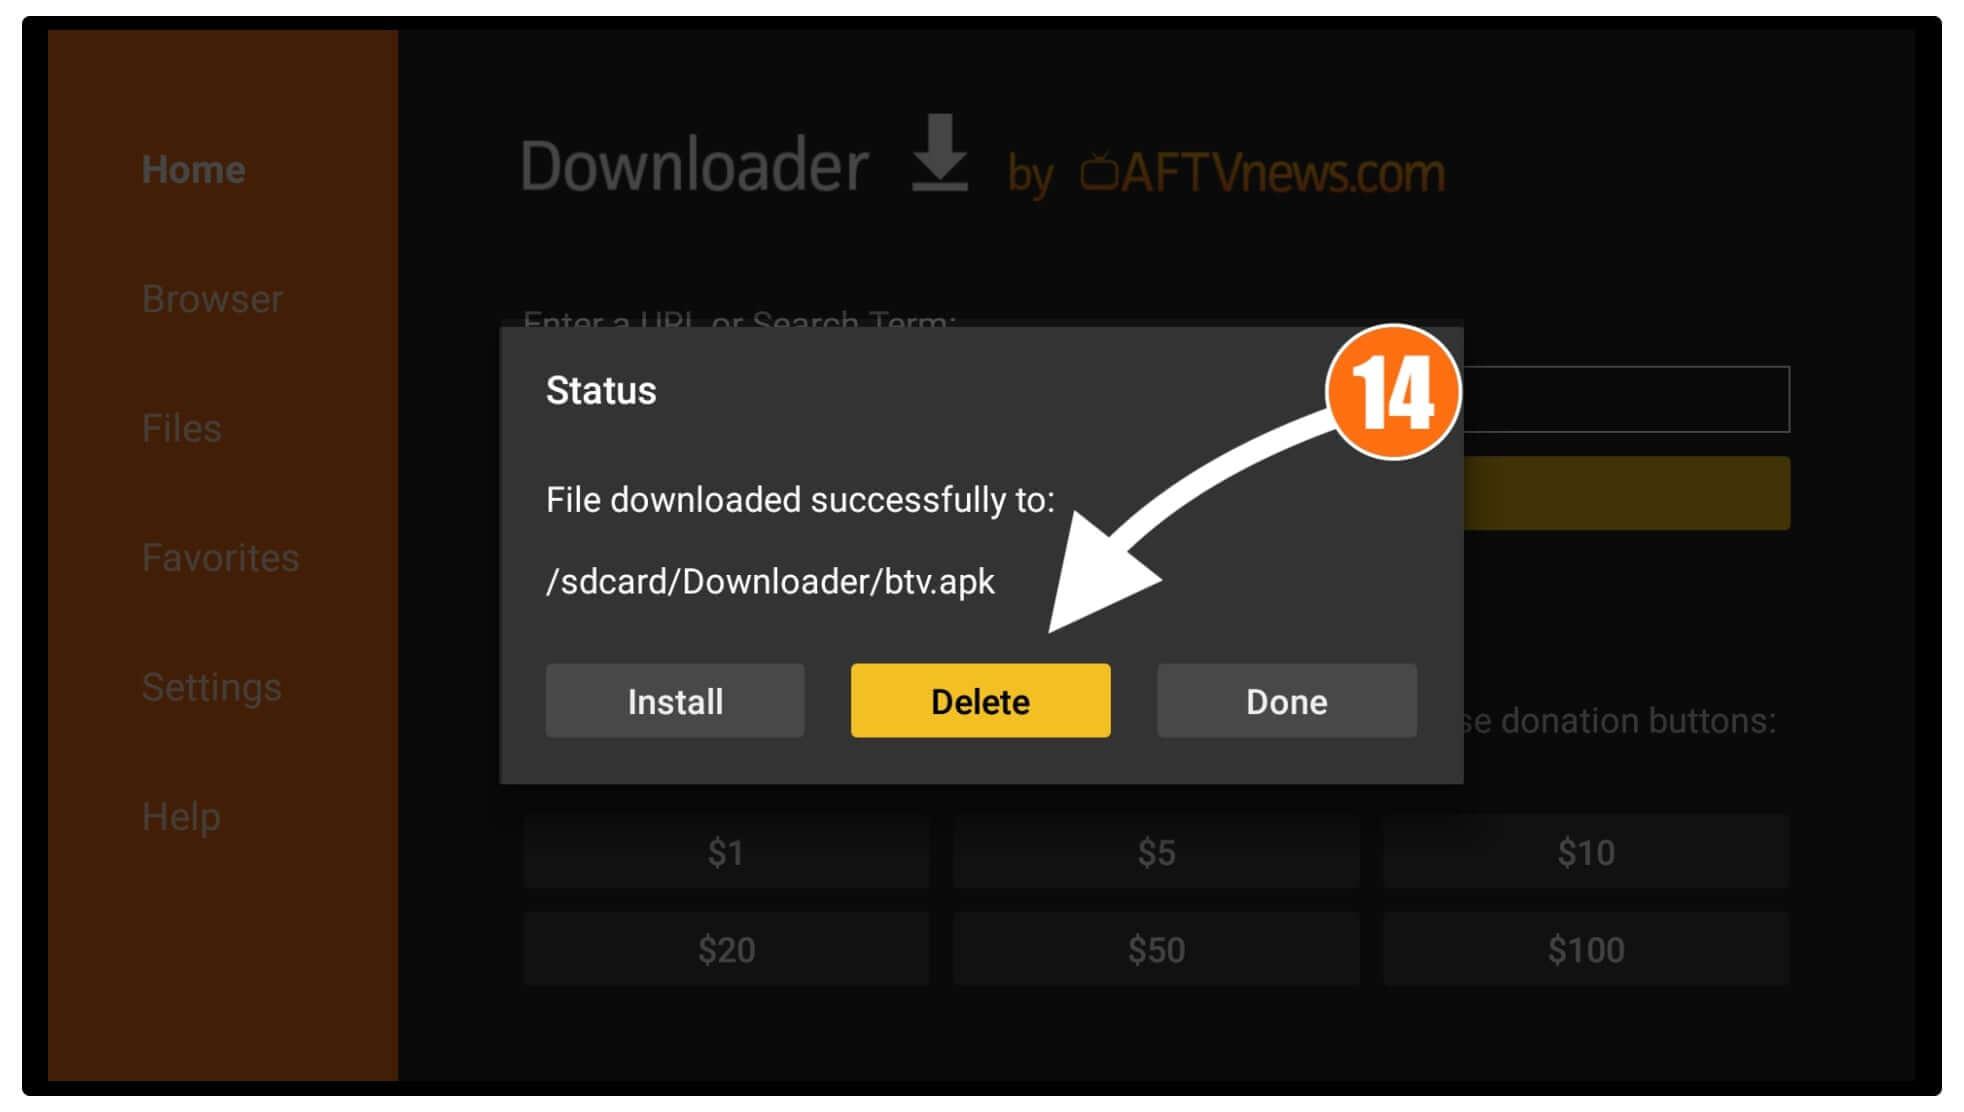 Remove-Backup-APK-BeeTV-on-Firestick